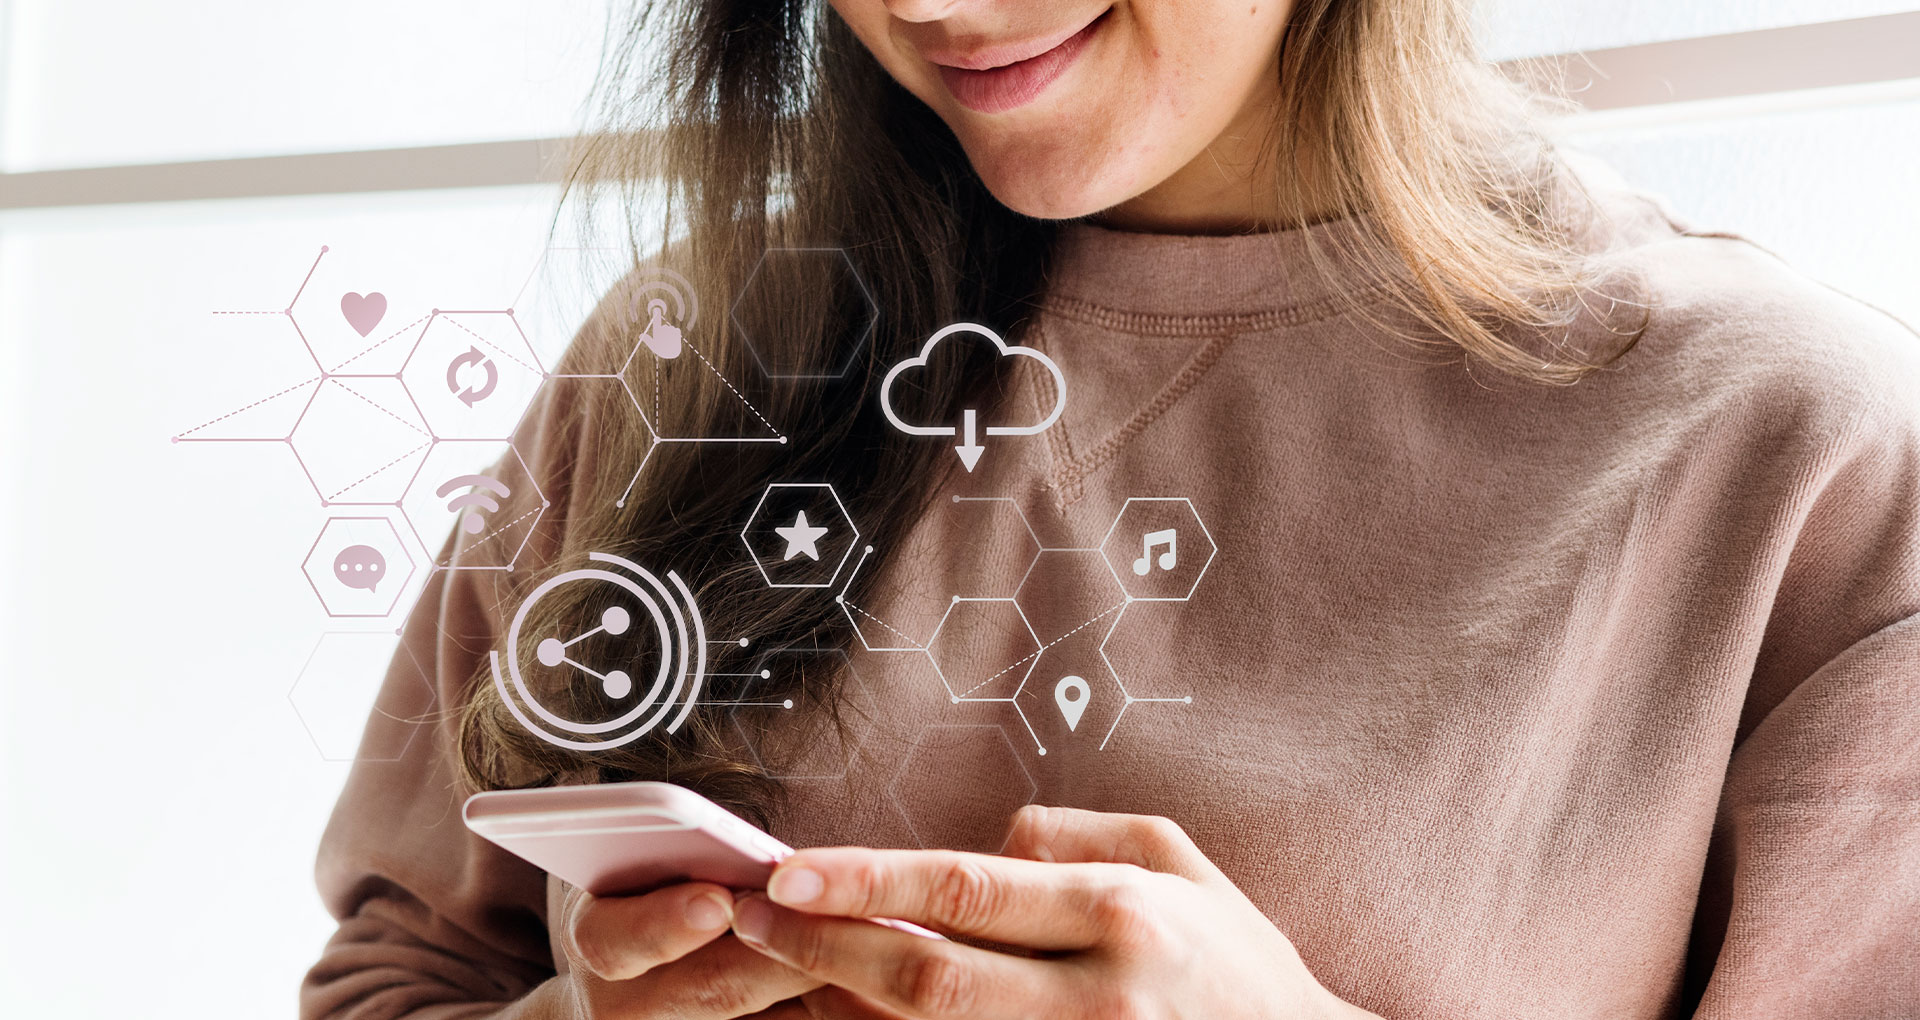 El futuro de la era digital